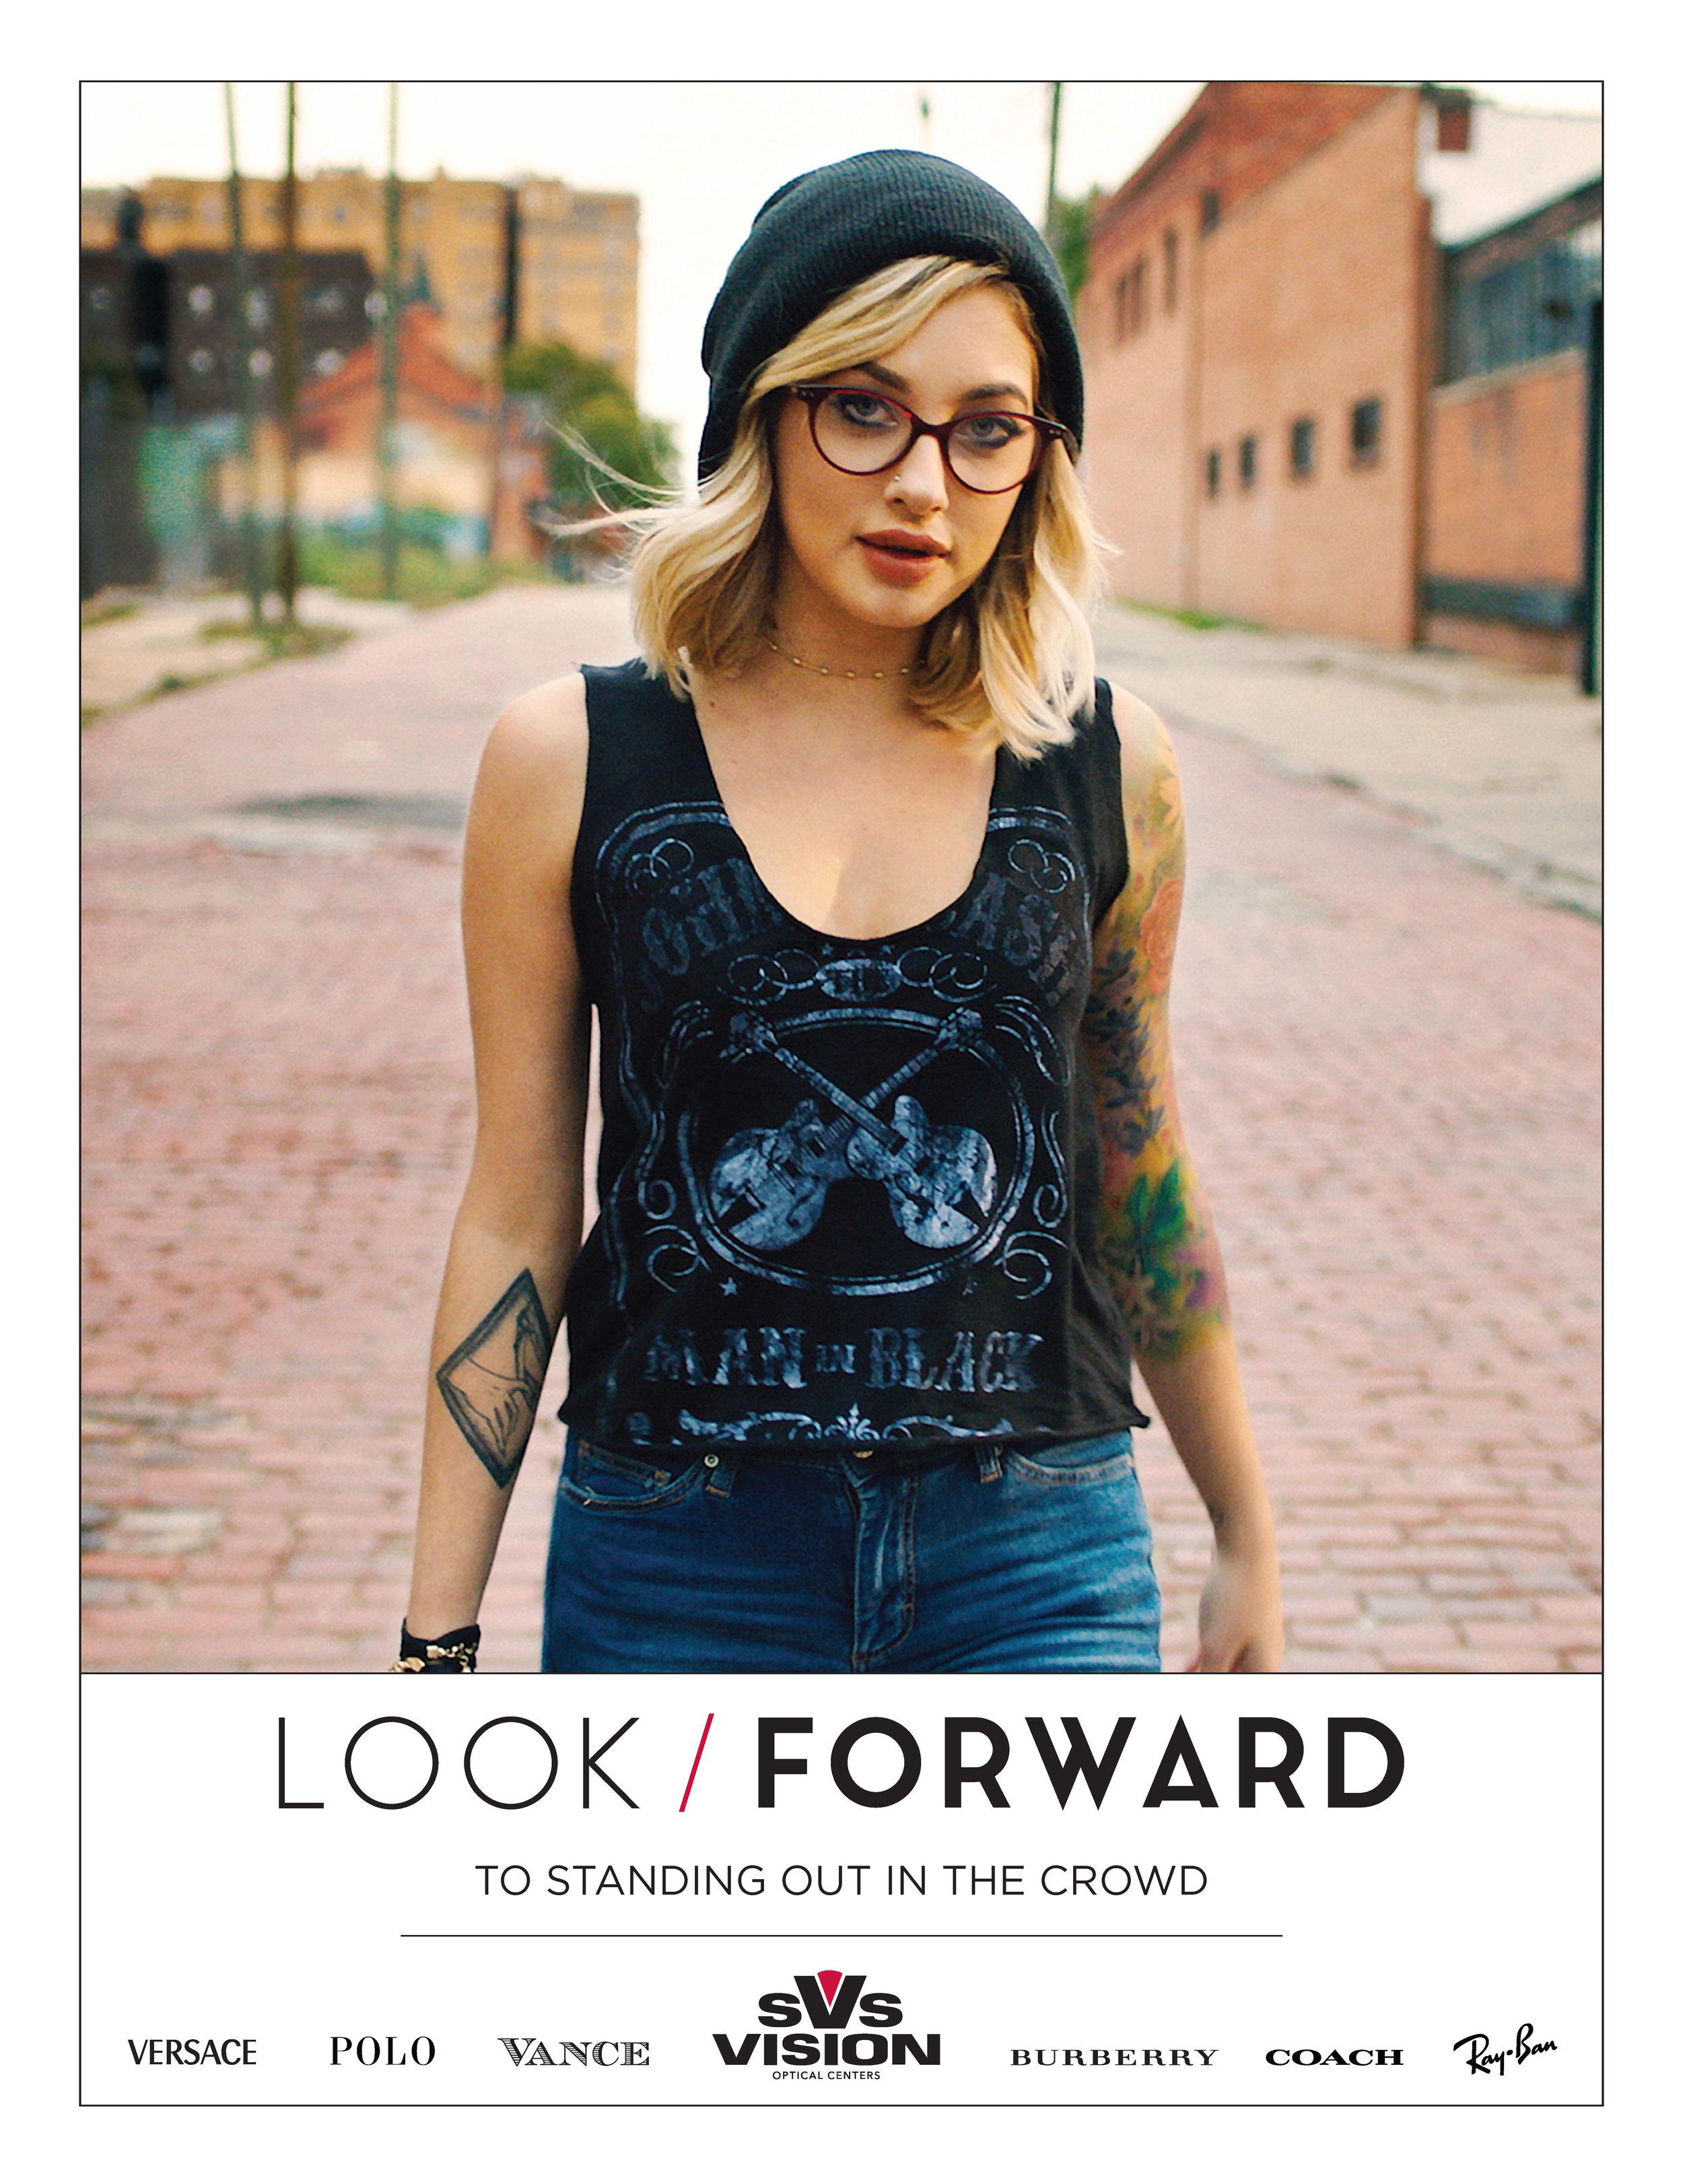 SVS955X16_LookForward_Posters_NoHeadlines_Page_3.jpg